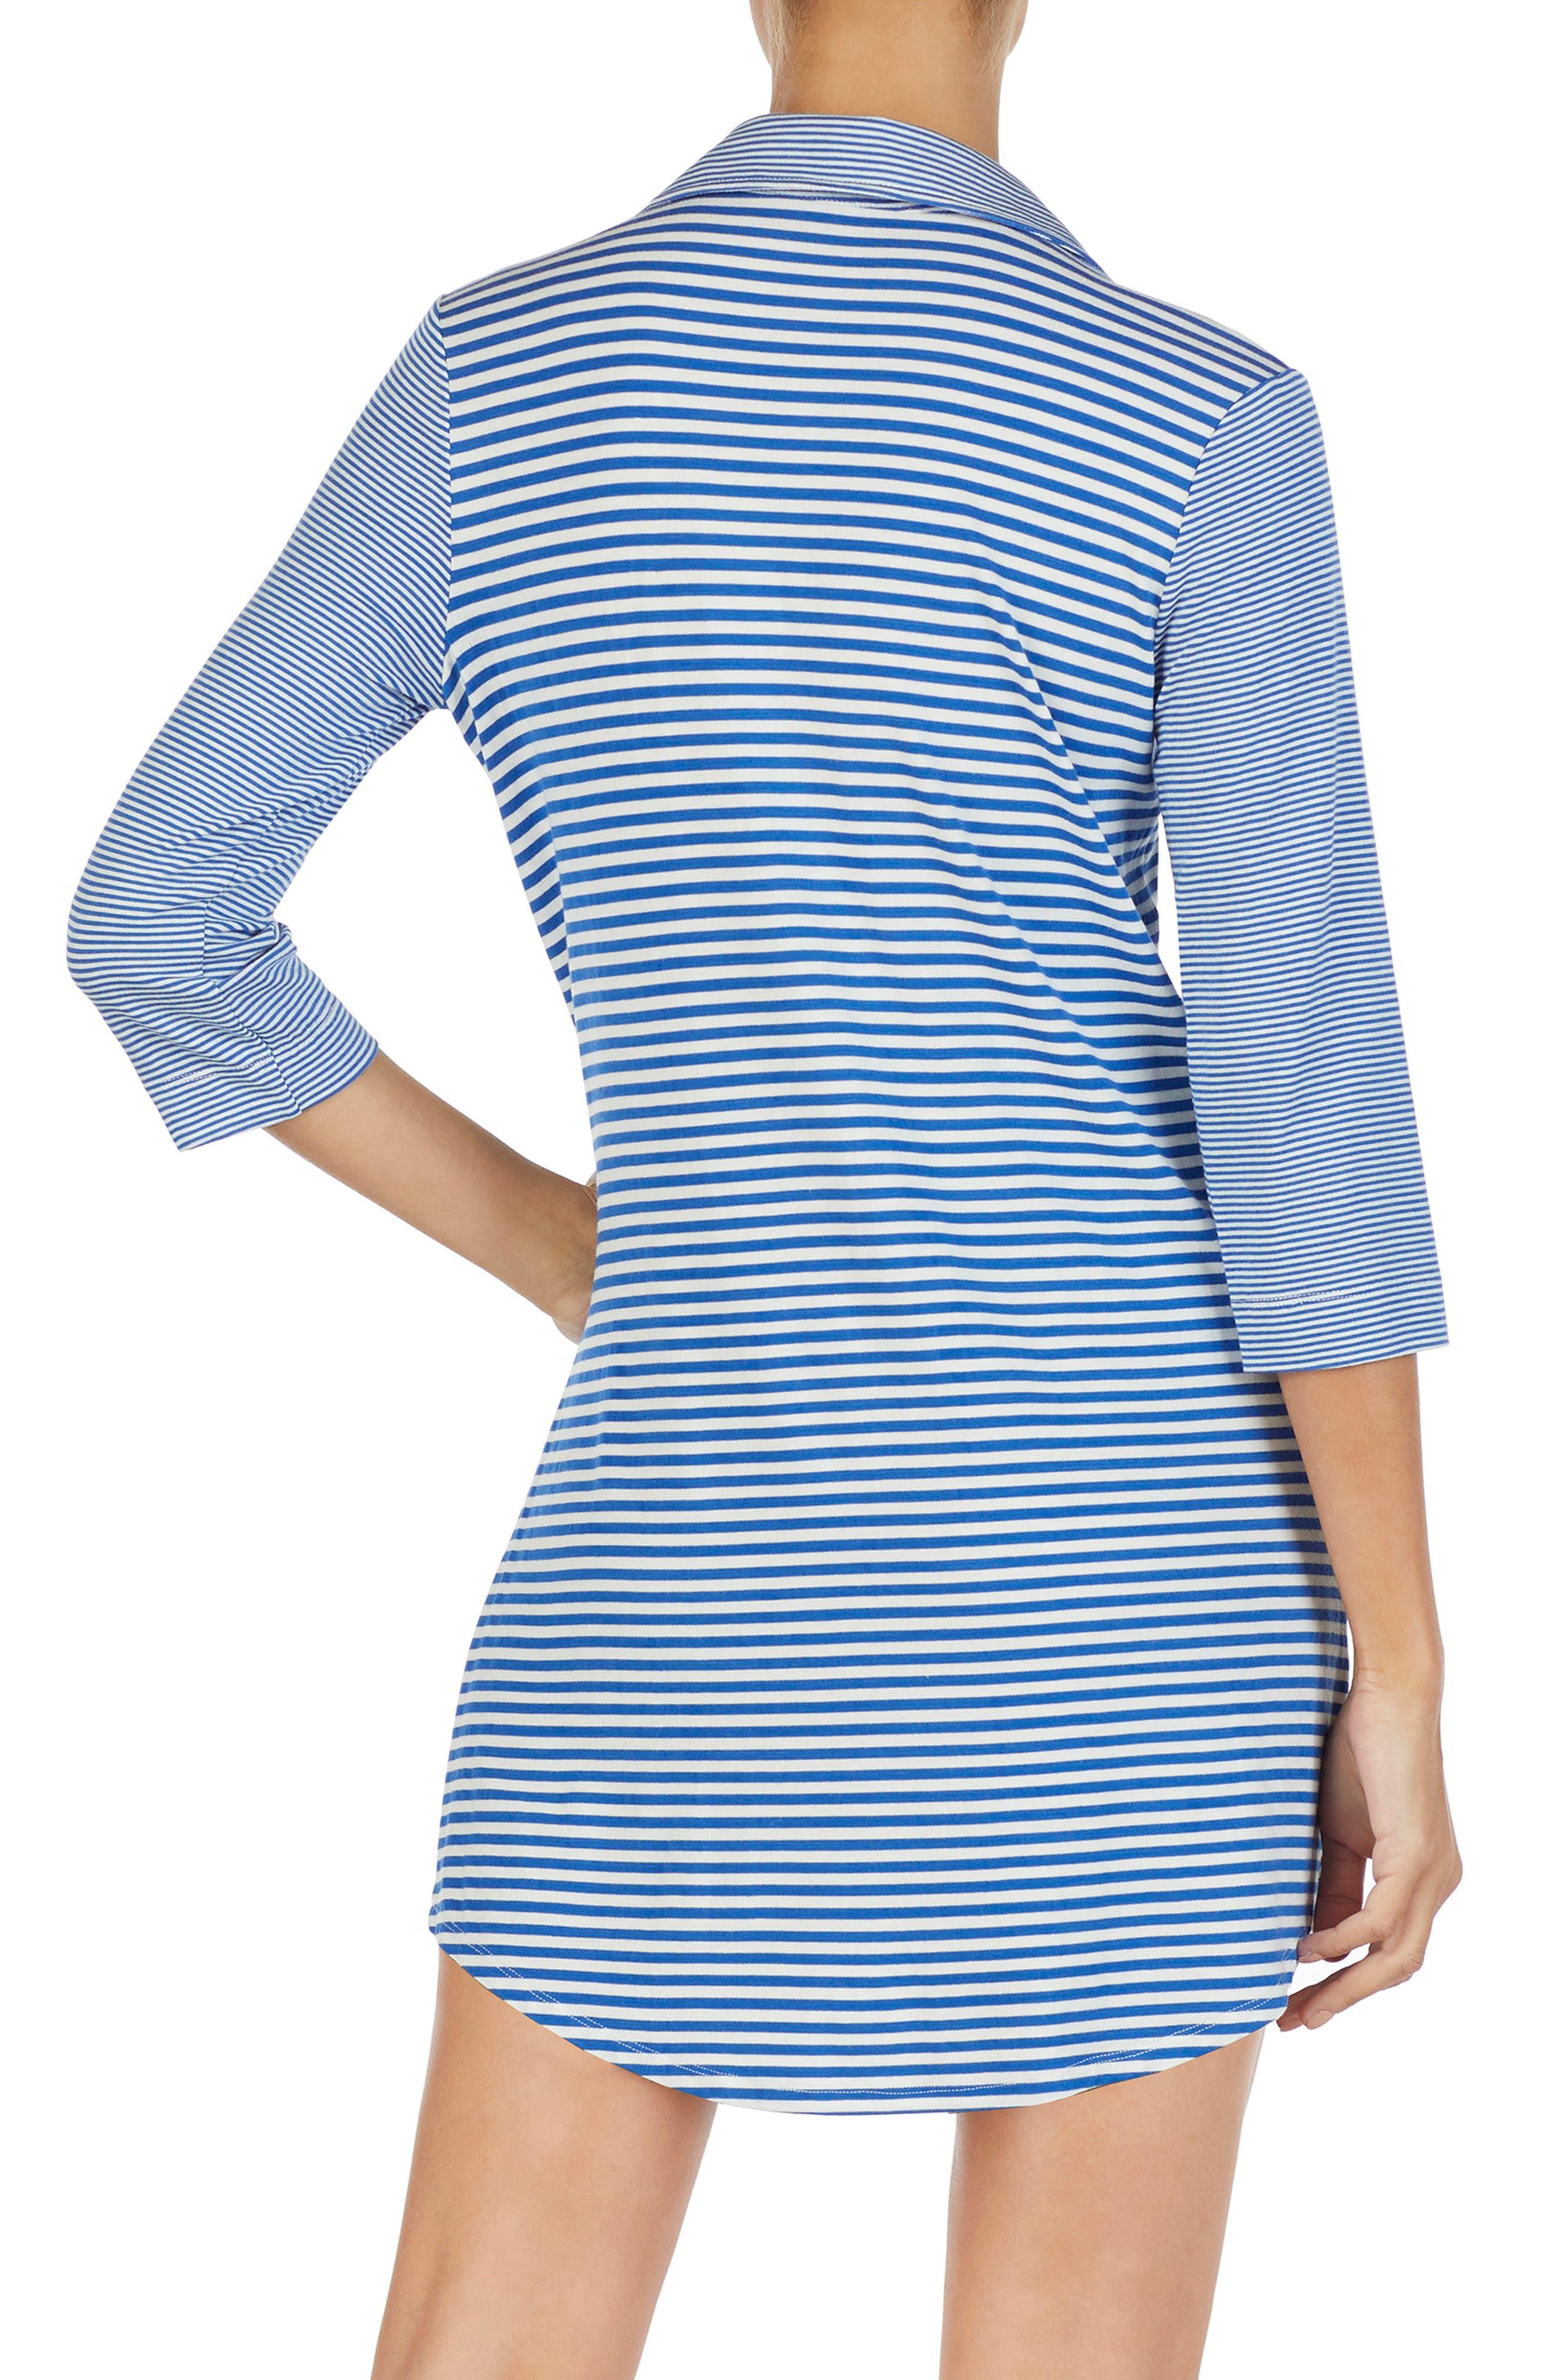 LAUREN RALPH LAUREN, Stripe Sleep Shirt, Alternate thumbnail 2, color, BLUE STRIPE